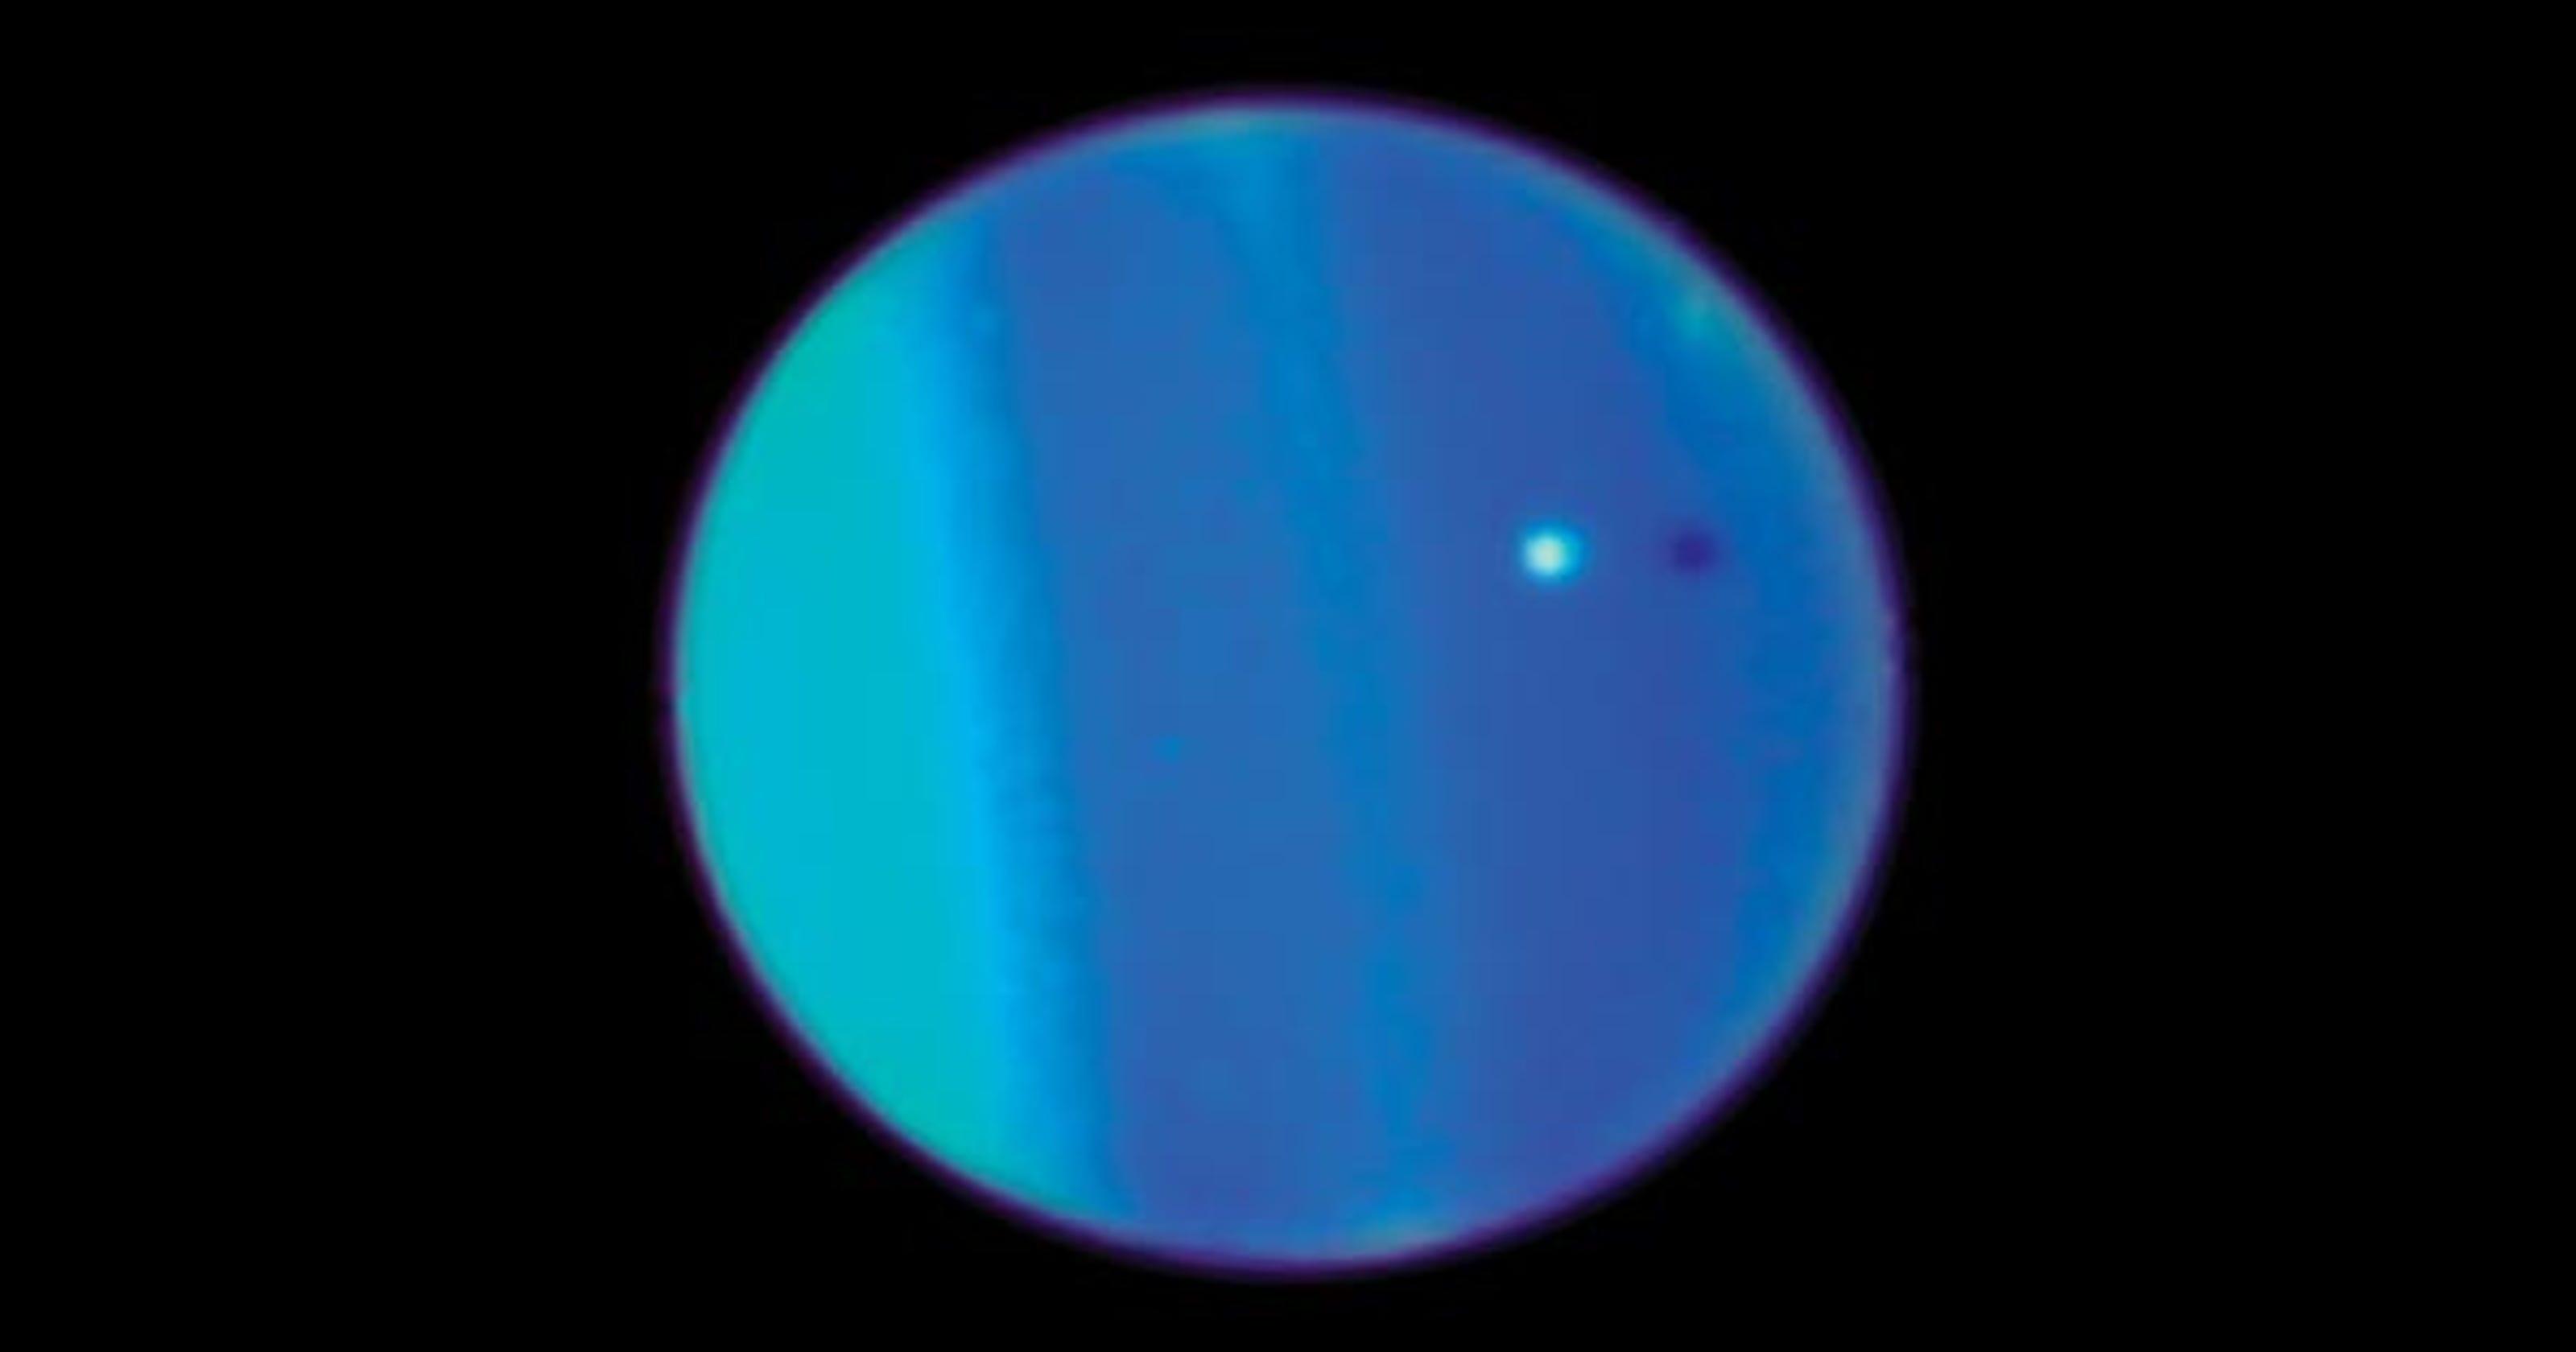 Uranus Smells Like Farts, Rotten Eggs, Oxford Researchers